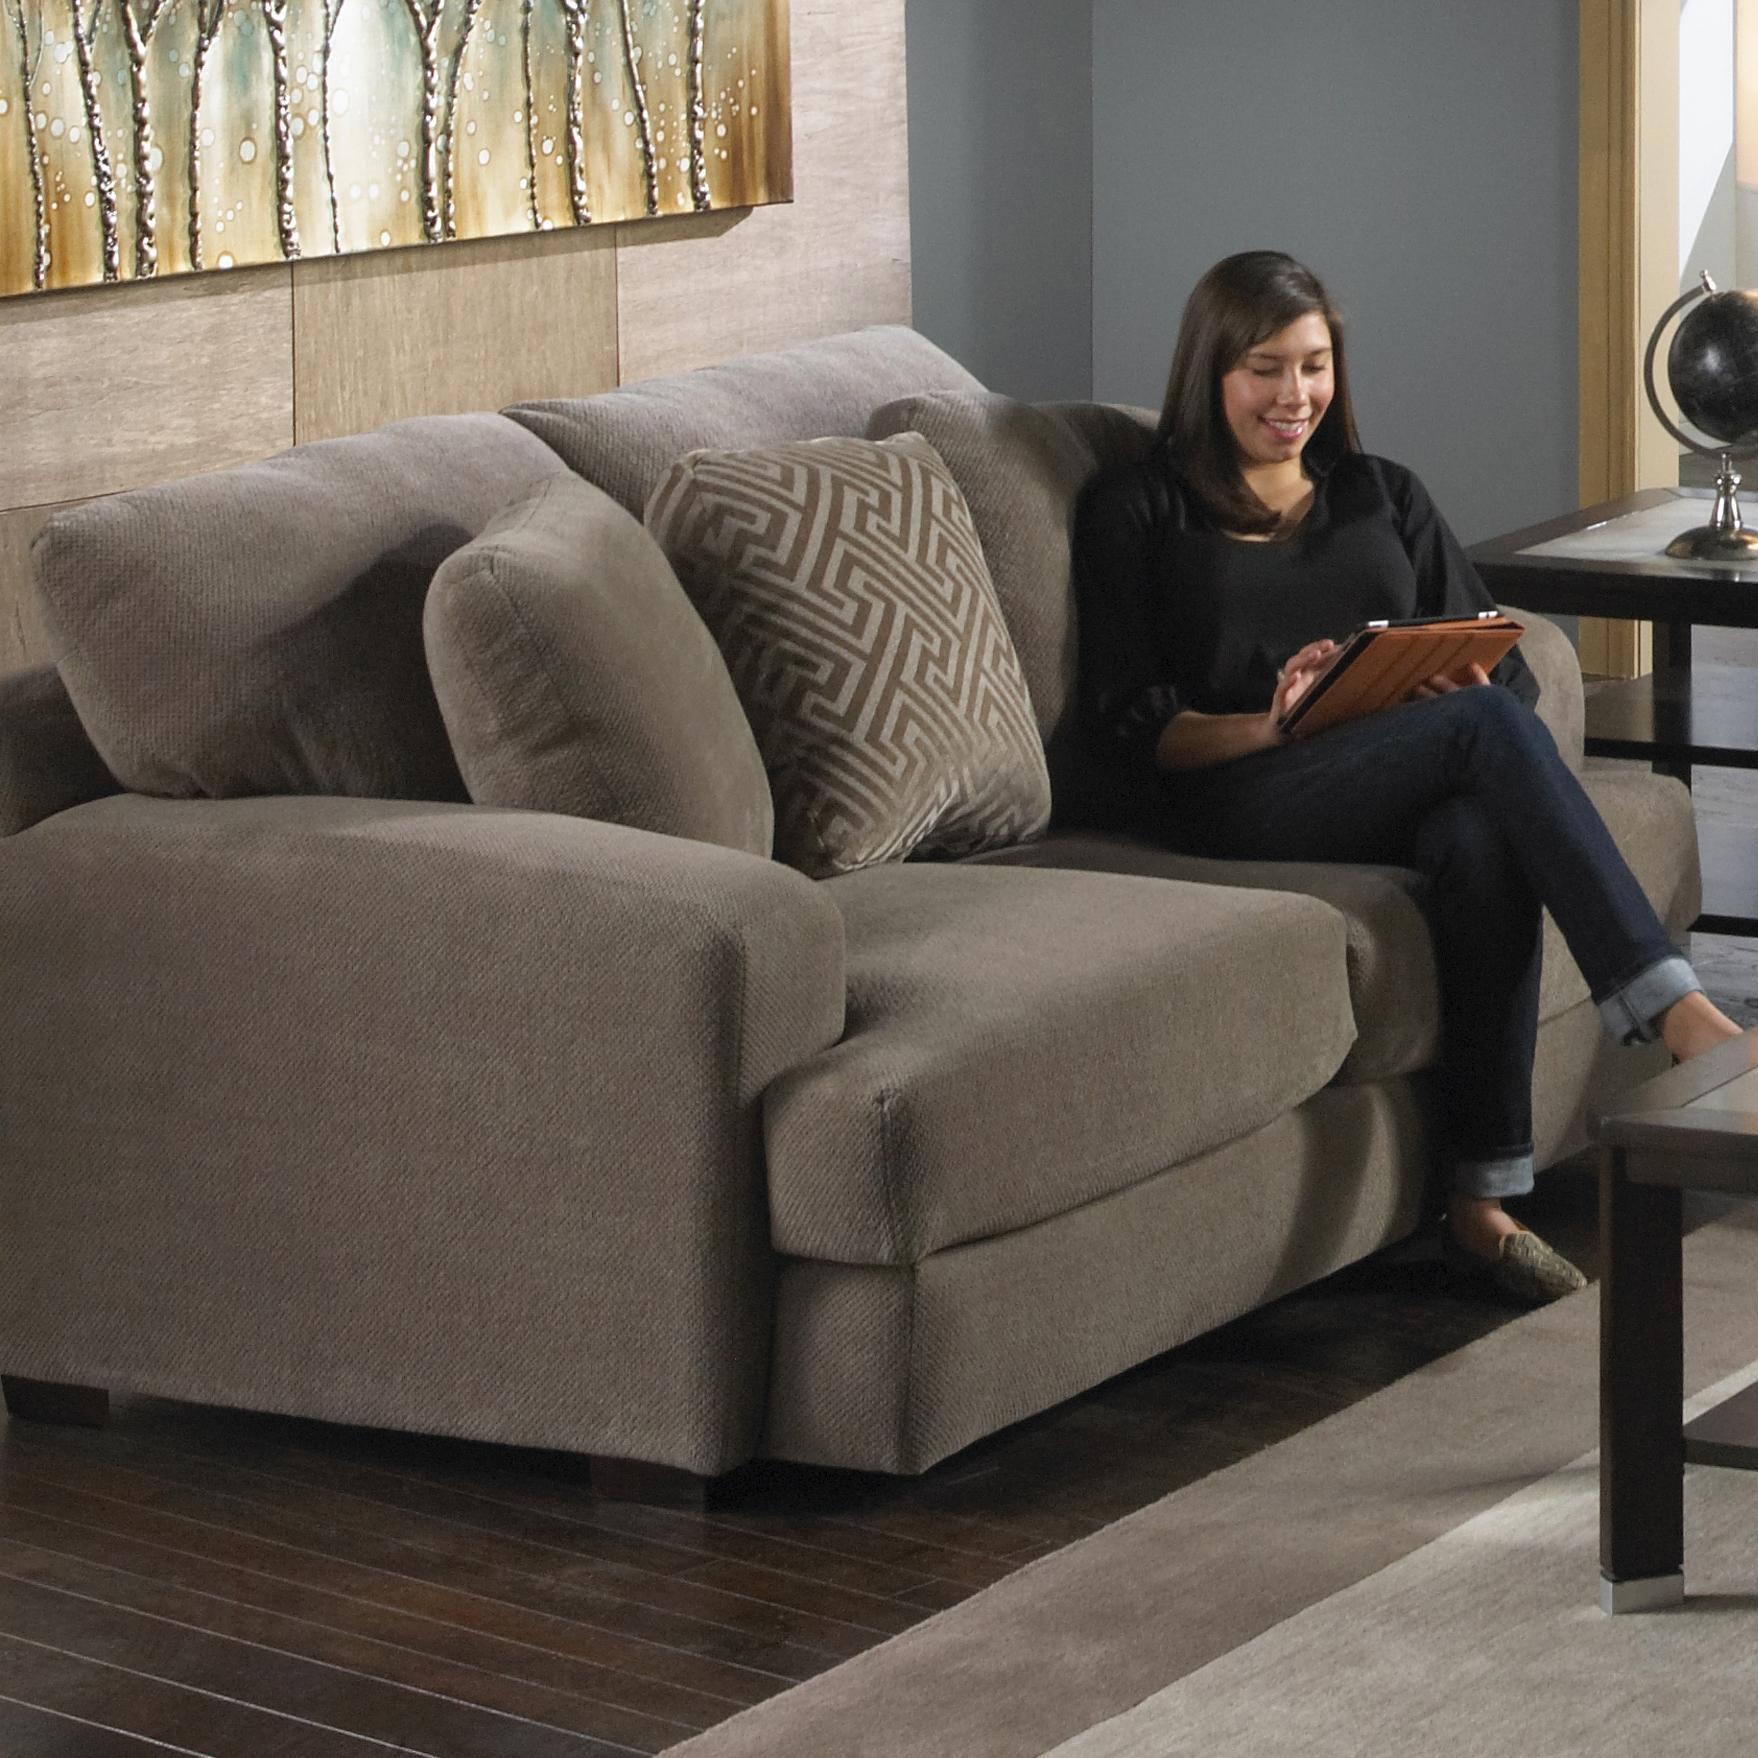 Jackson Furniture Palisades Loveseat - Item Number: 4186-02 1983-49